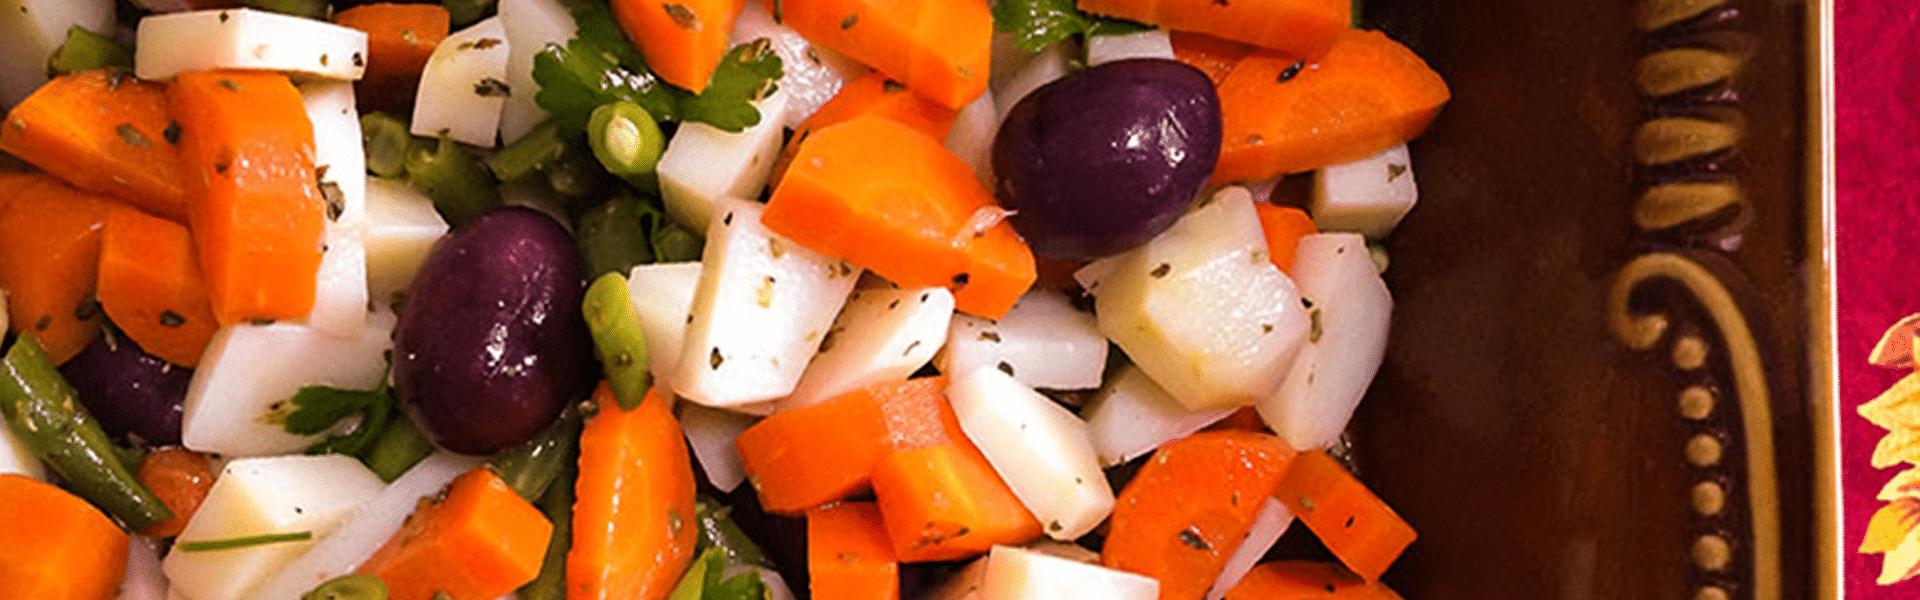 receitas-de-salada-capa